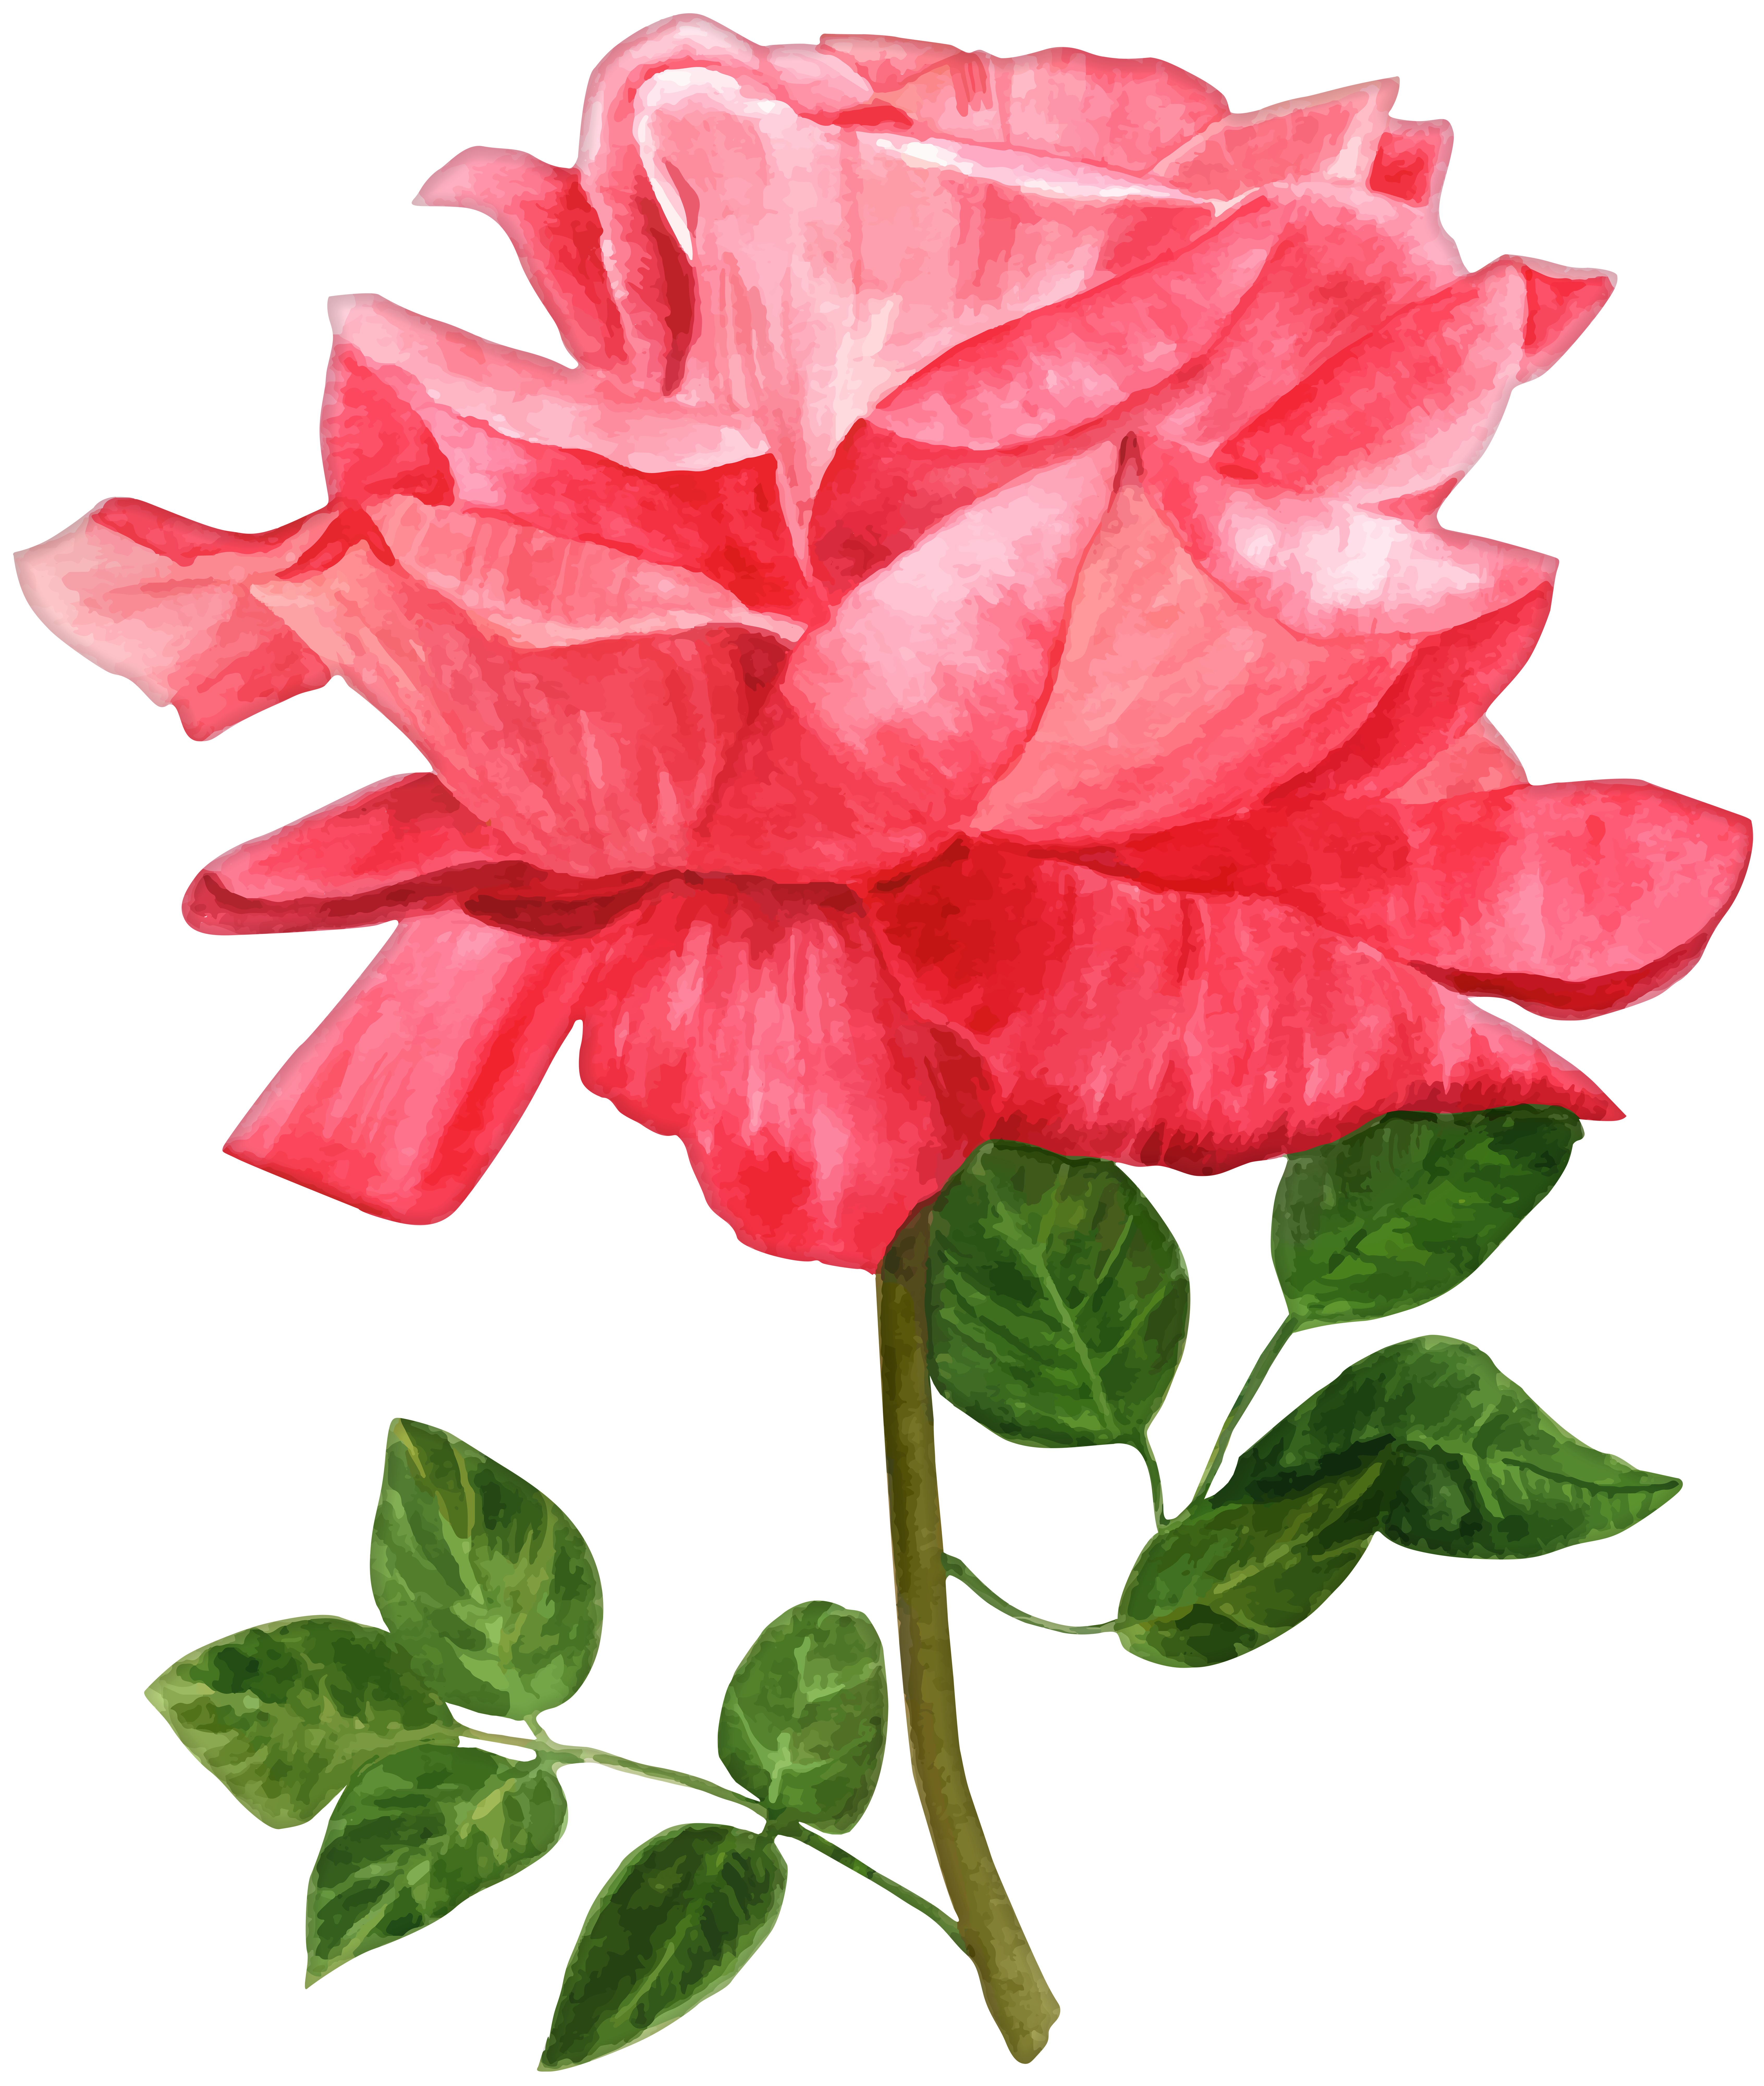 Watercolor flower png. Rose clip art image